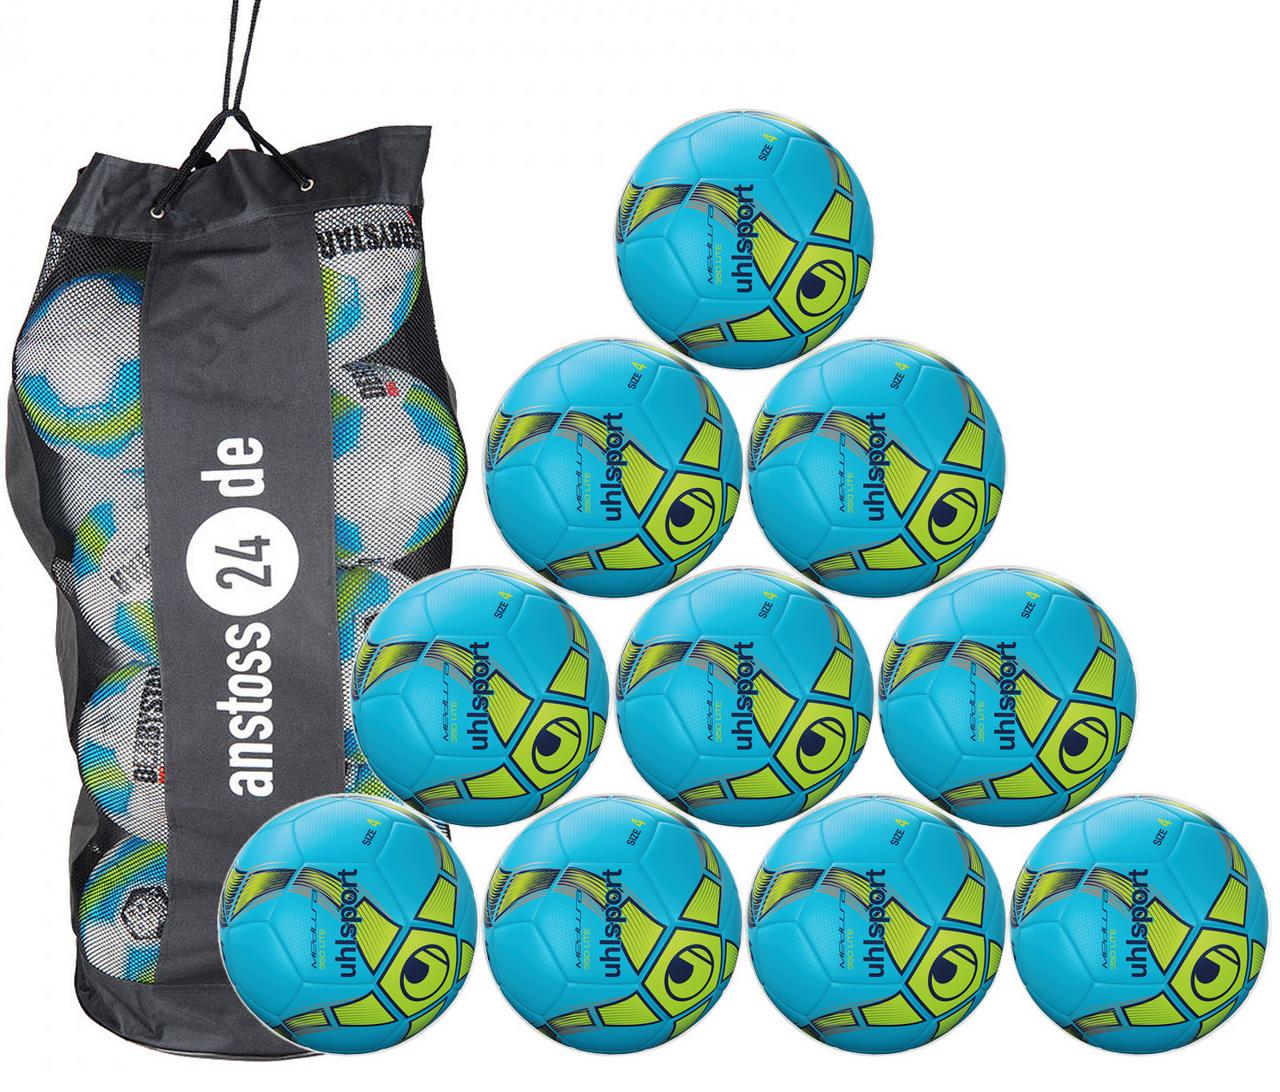 10 x Uhlsport Youth Ball Futsal - MEDUSA ANTEO 350 LITE incl. ball bag